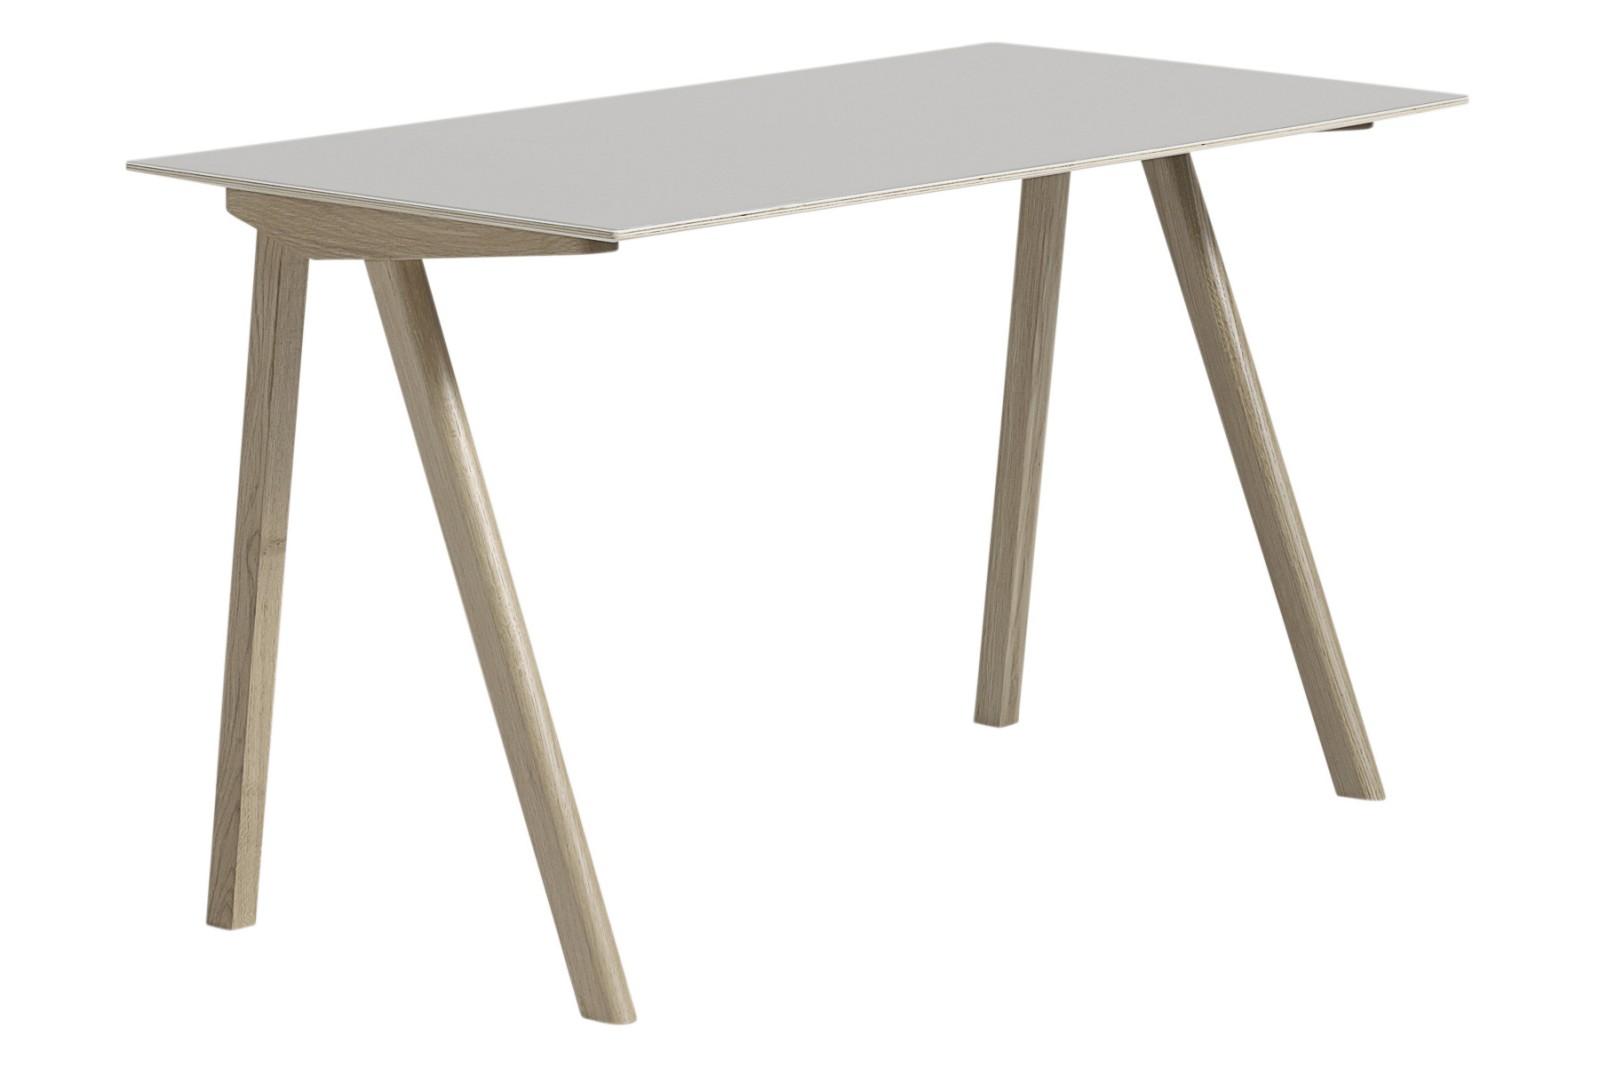 Copenhague Linoleum Top Desk CPH90 Matt Lacquered Solid Oak Base, White Laminate Top